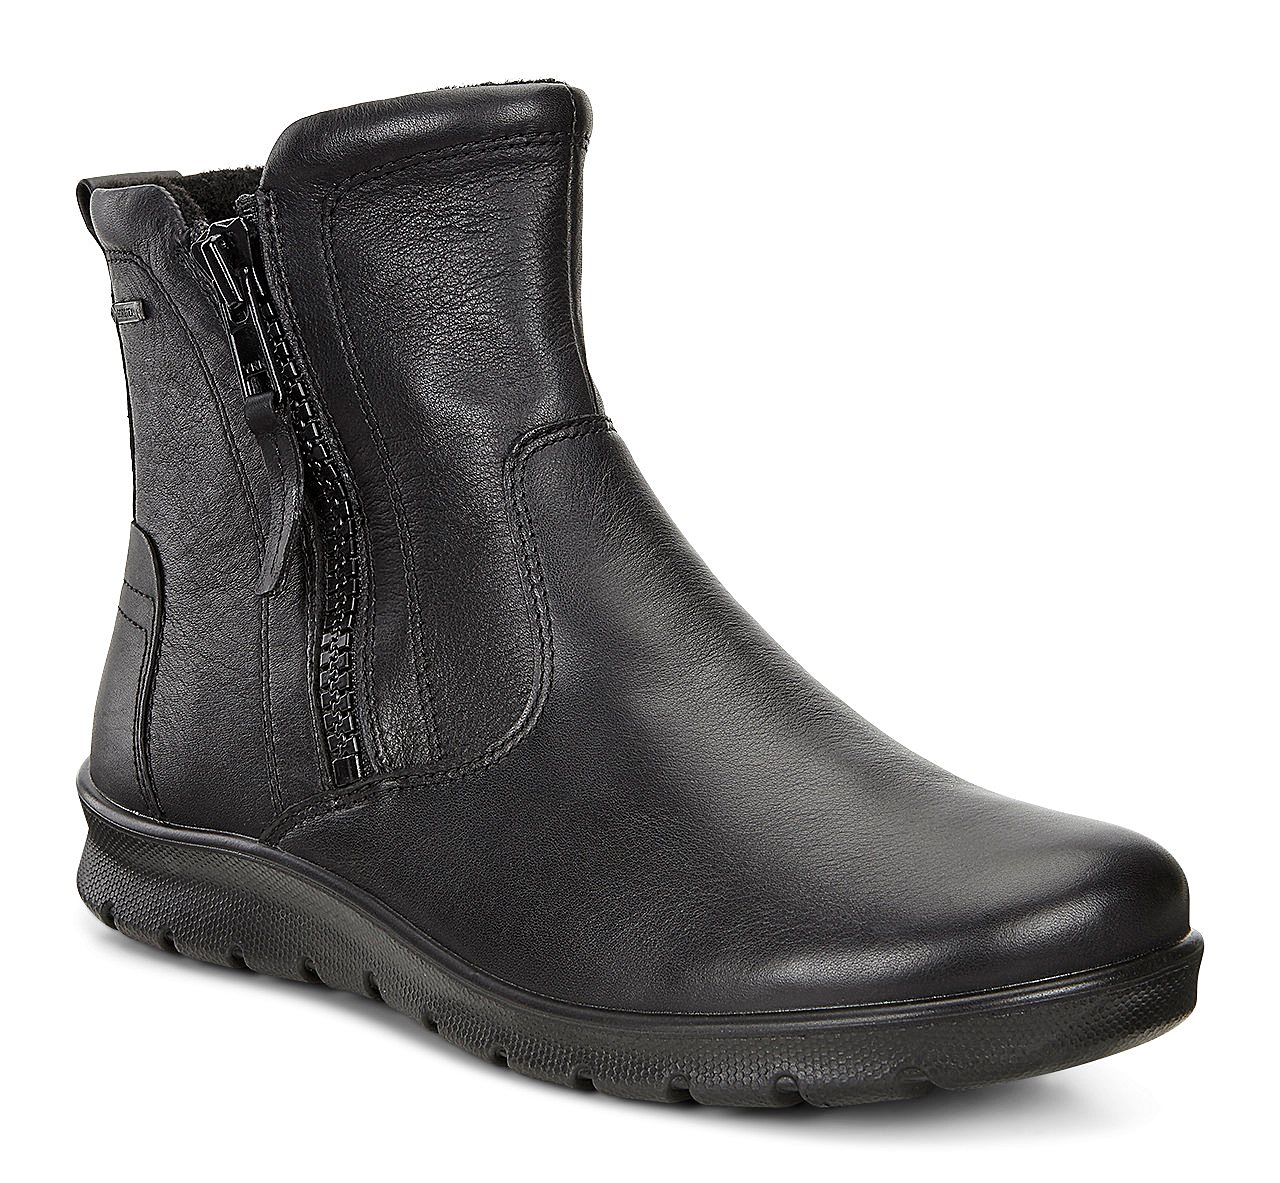 3f976ff0 ECCO BABETT BOOT | BOOTS | SHOES | WOMEN | ECCO® OFFICIAL ONLINE STORE